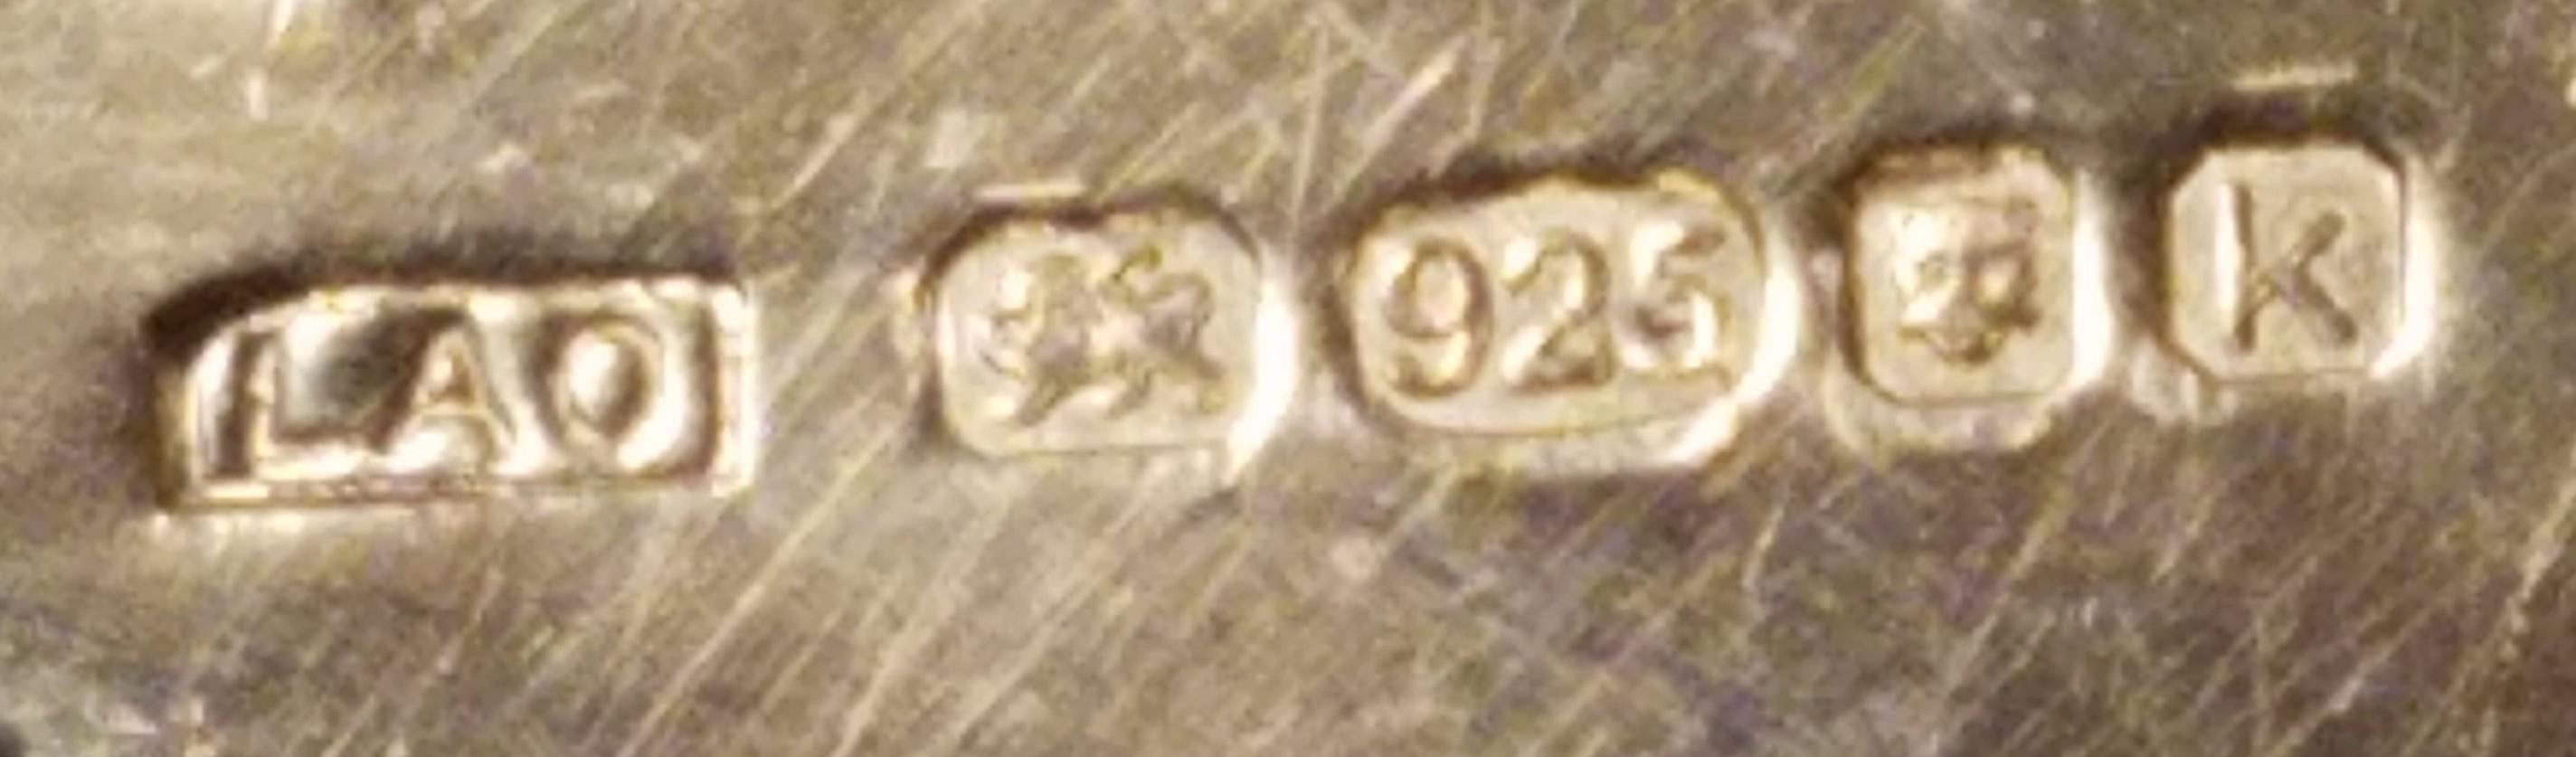 BOSON 05